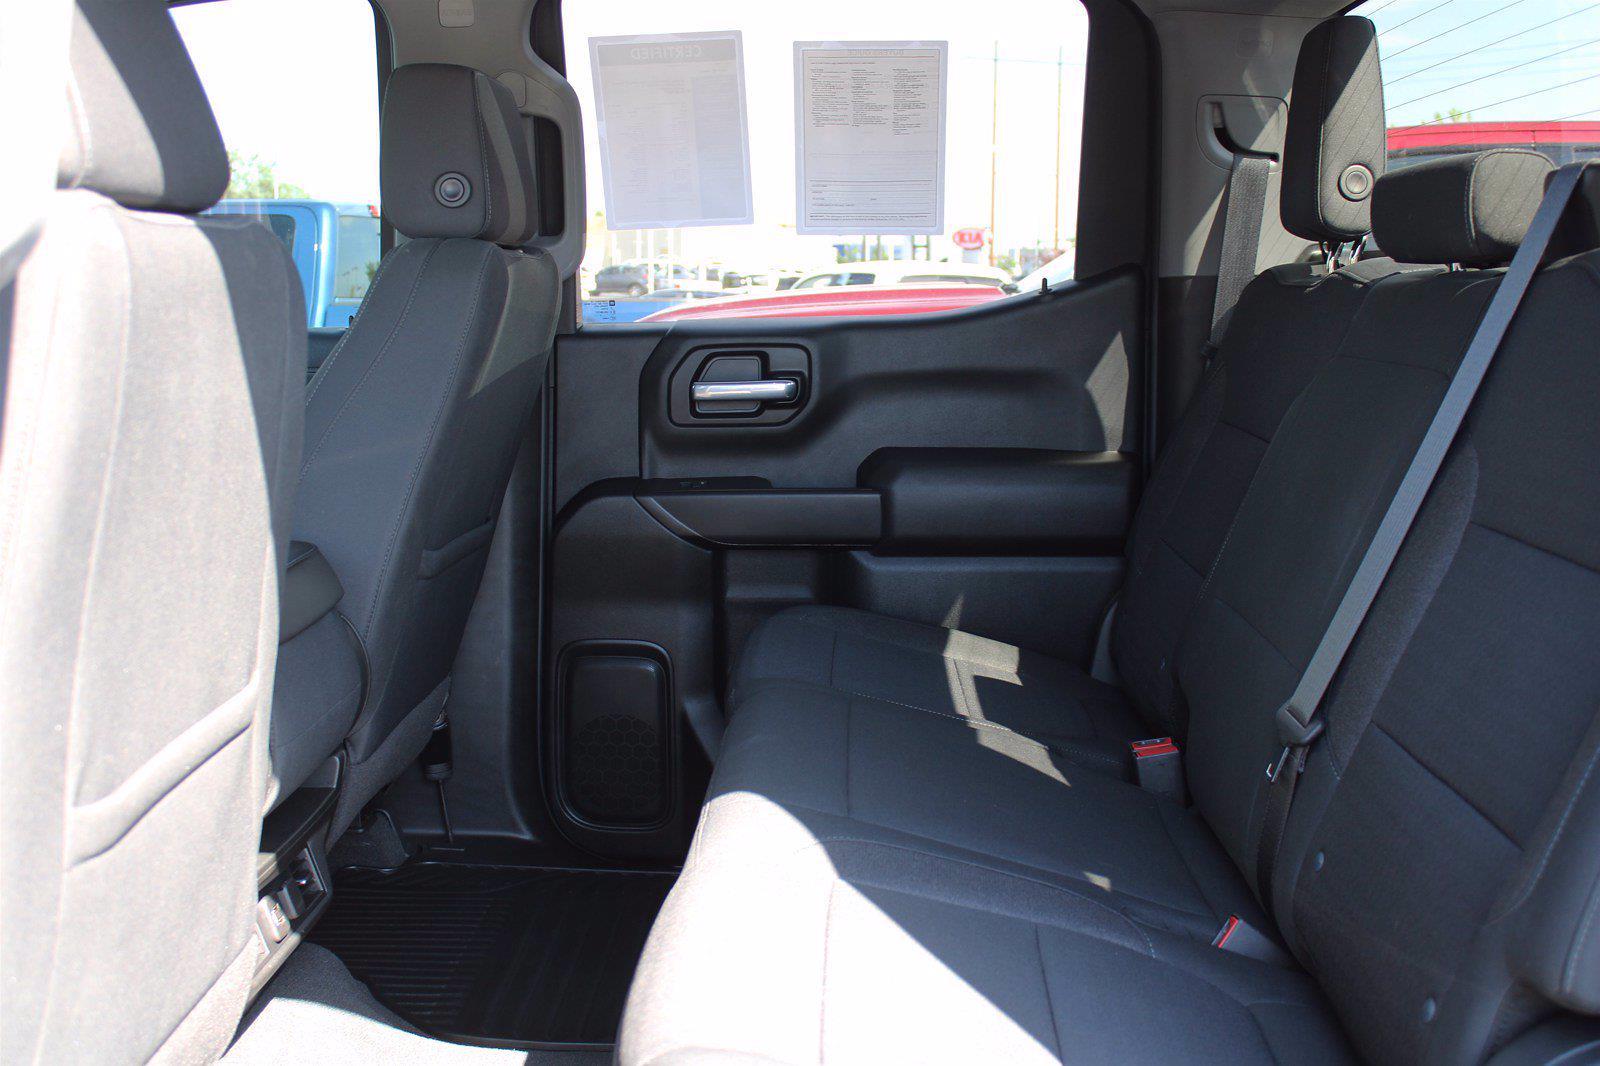 2021 Chevrolet Silverado 1500 Crew Cab 4x4, Pickup #DTC2082 - photo 1